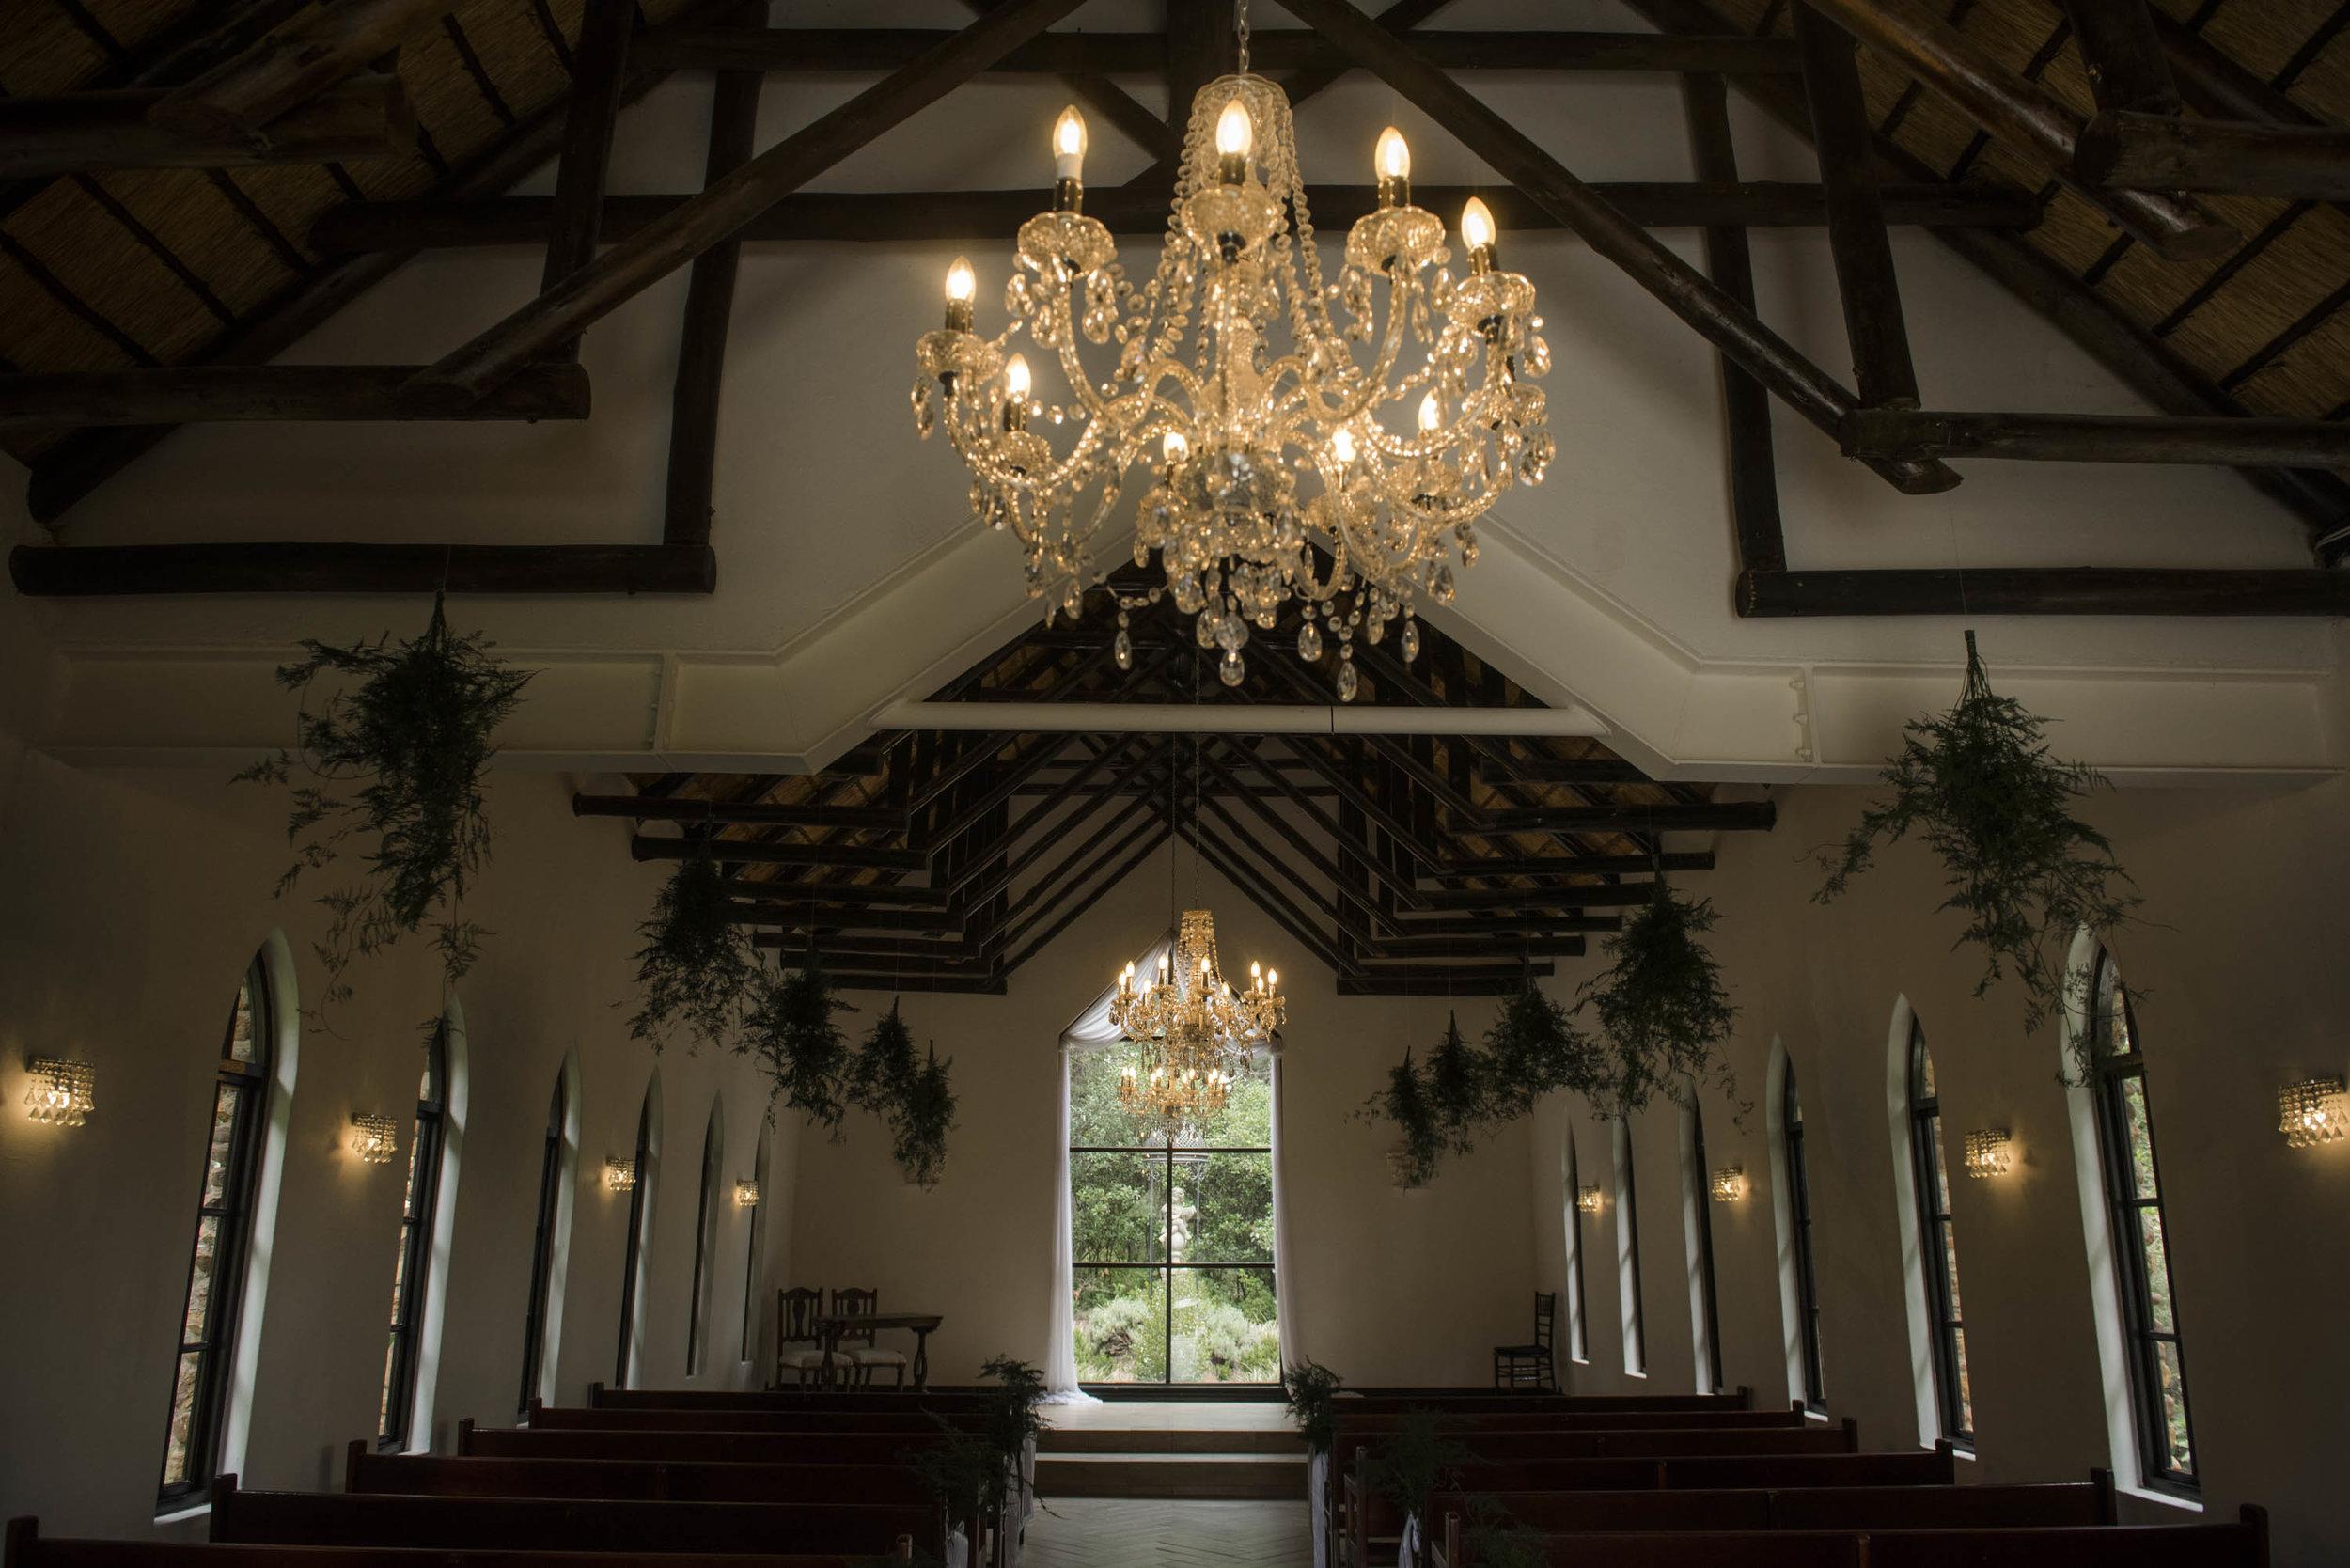 007h-Toadburry-Hall-wedding-photos.JPG